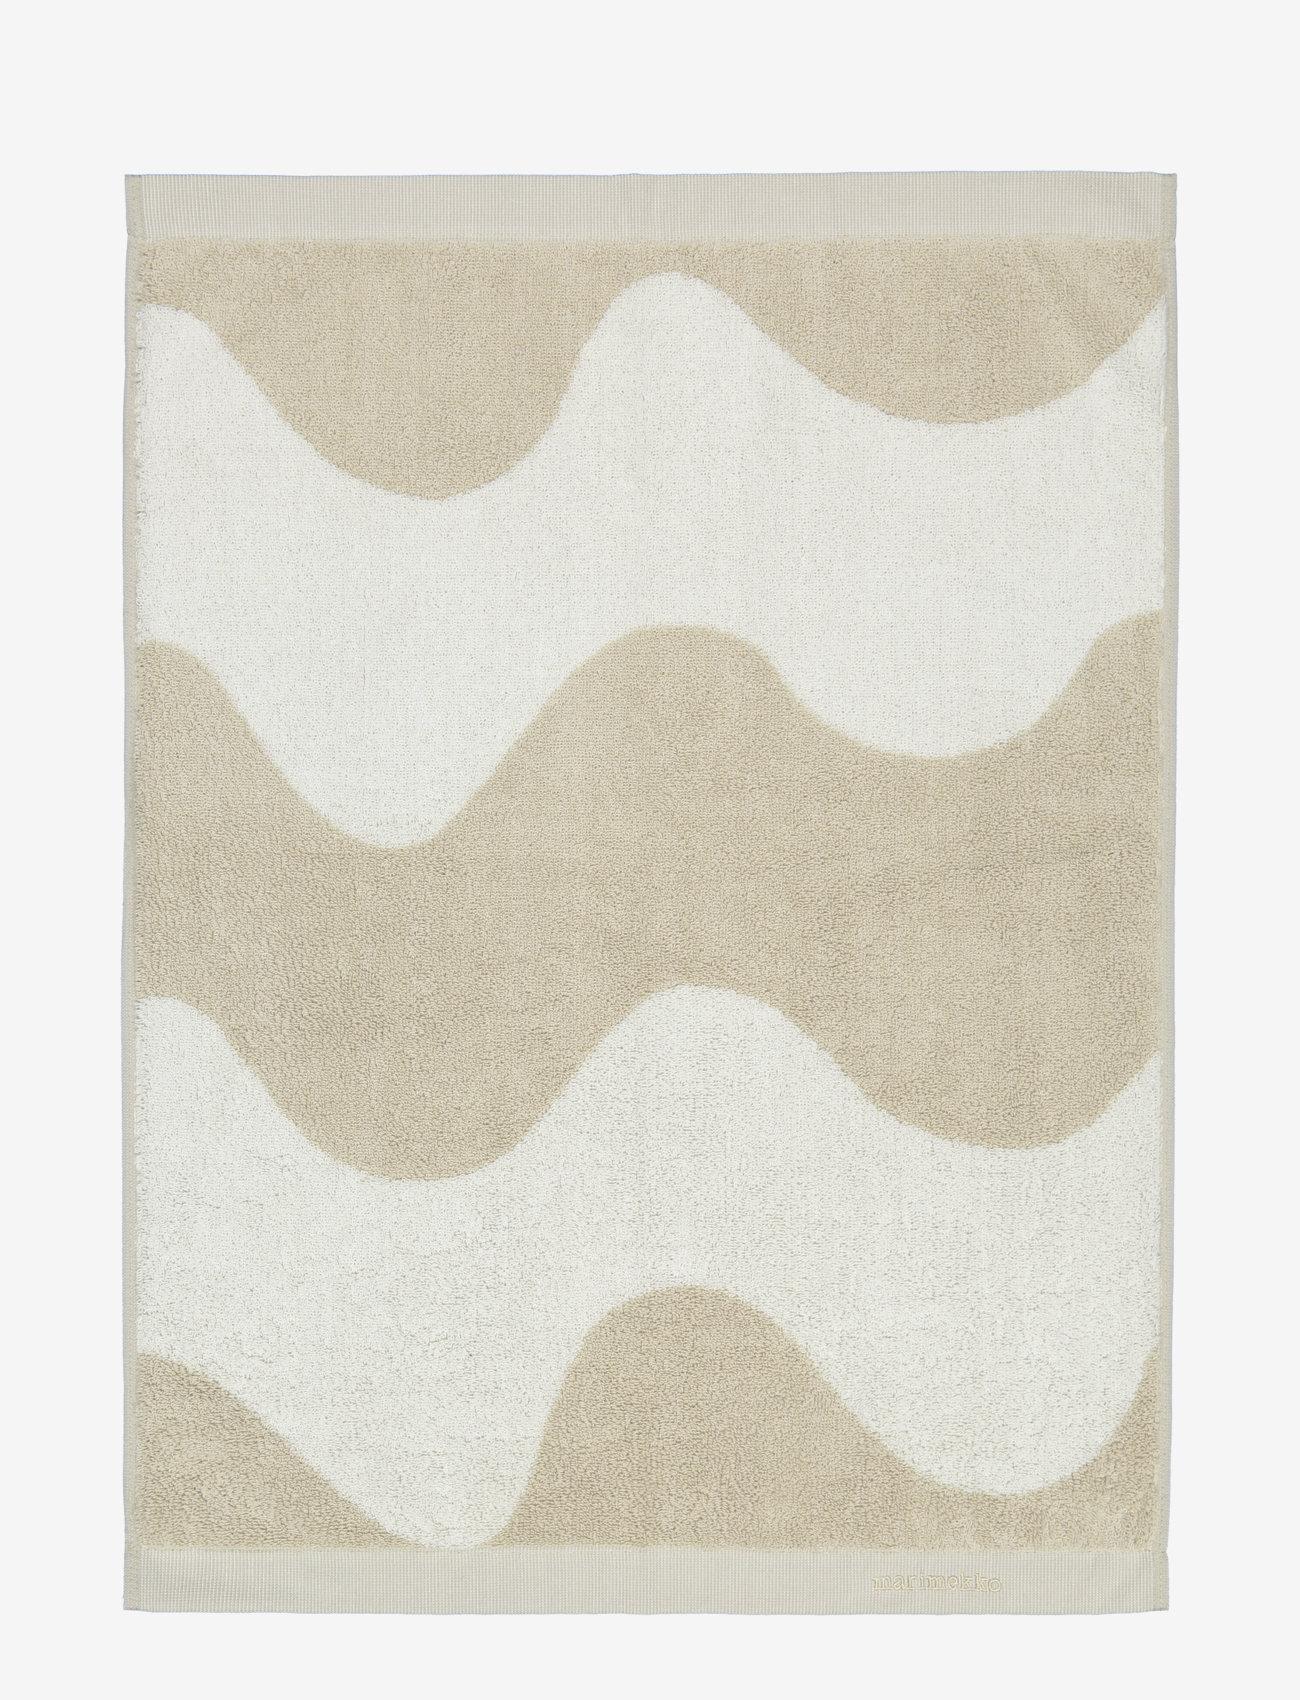 Marimekko Home - LOKKI HAND TOWEL - hand towels & bath towels - beige, white - 1